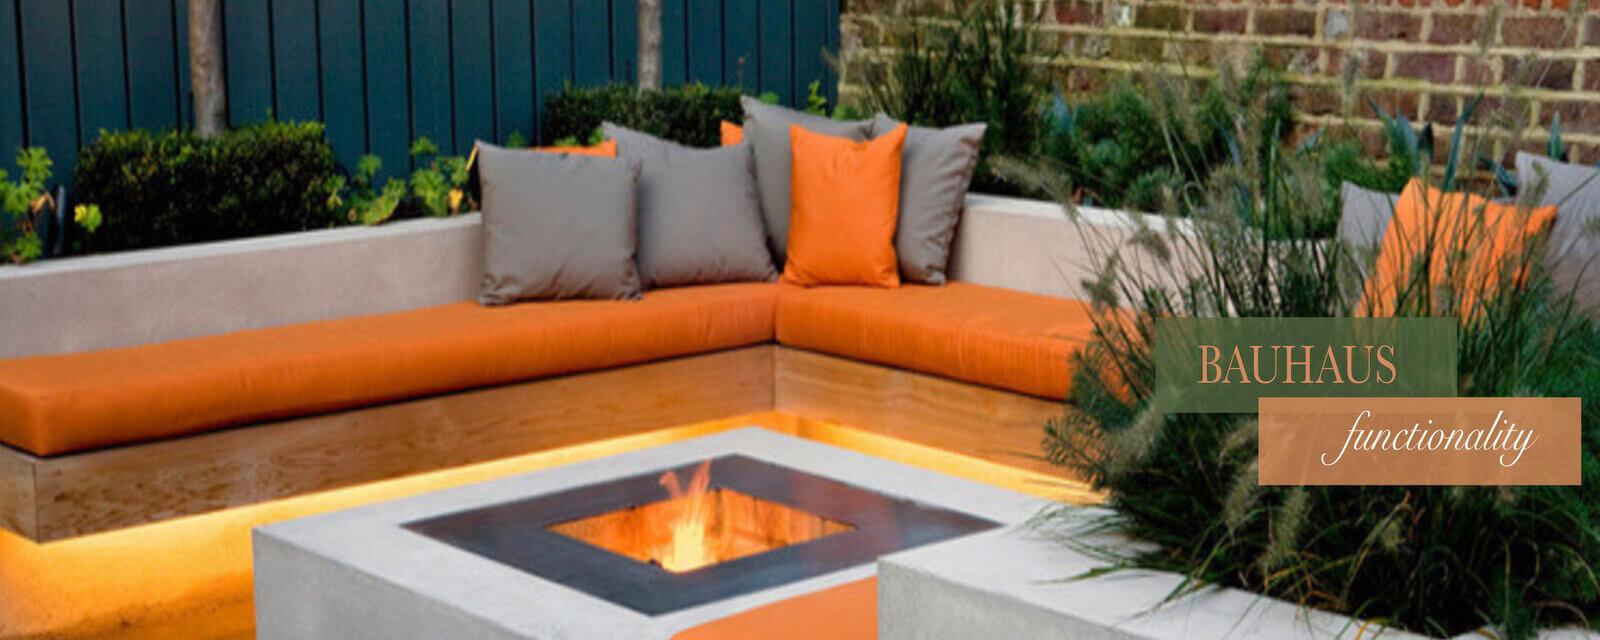 Bauhaus Outdoor Furniture